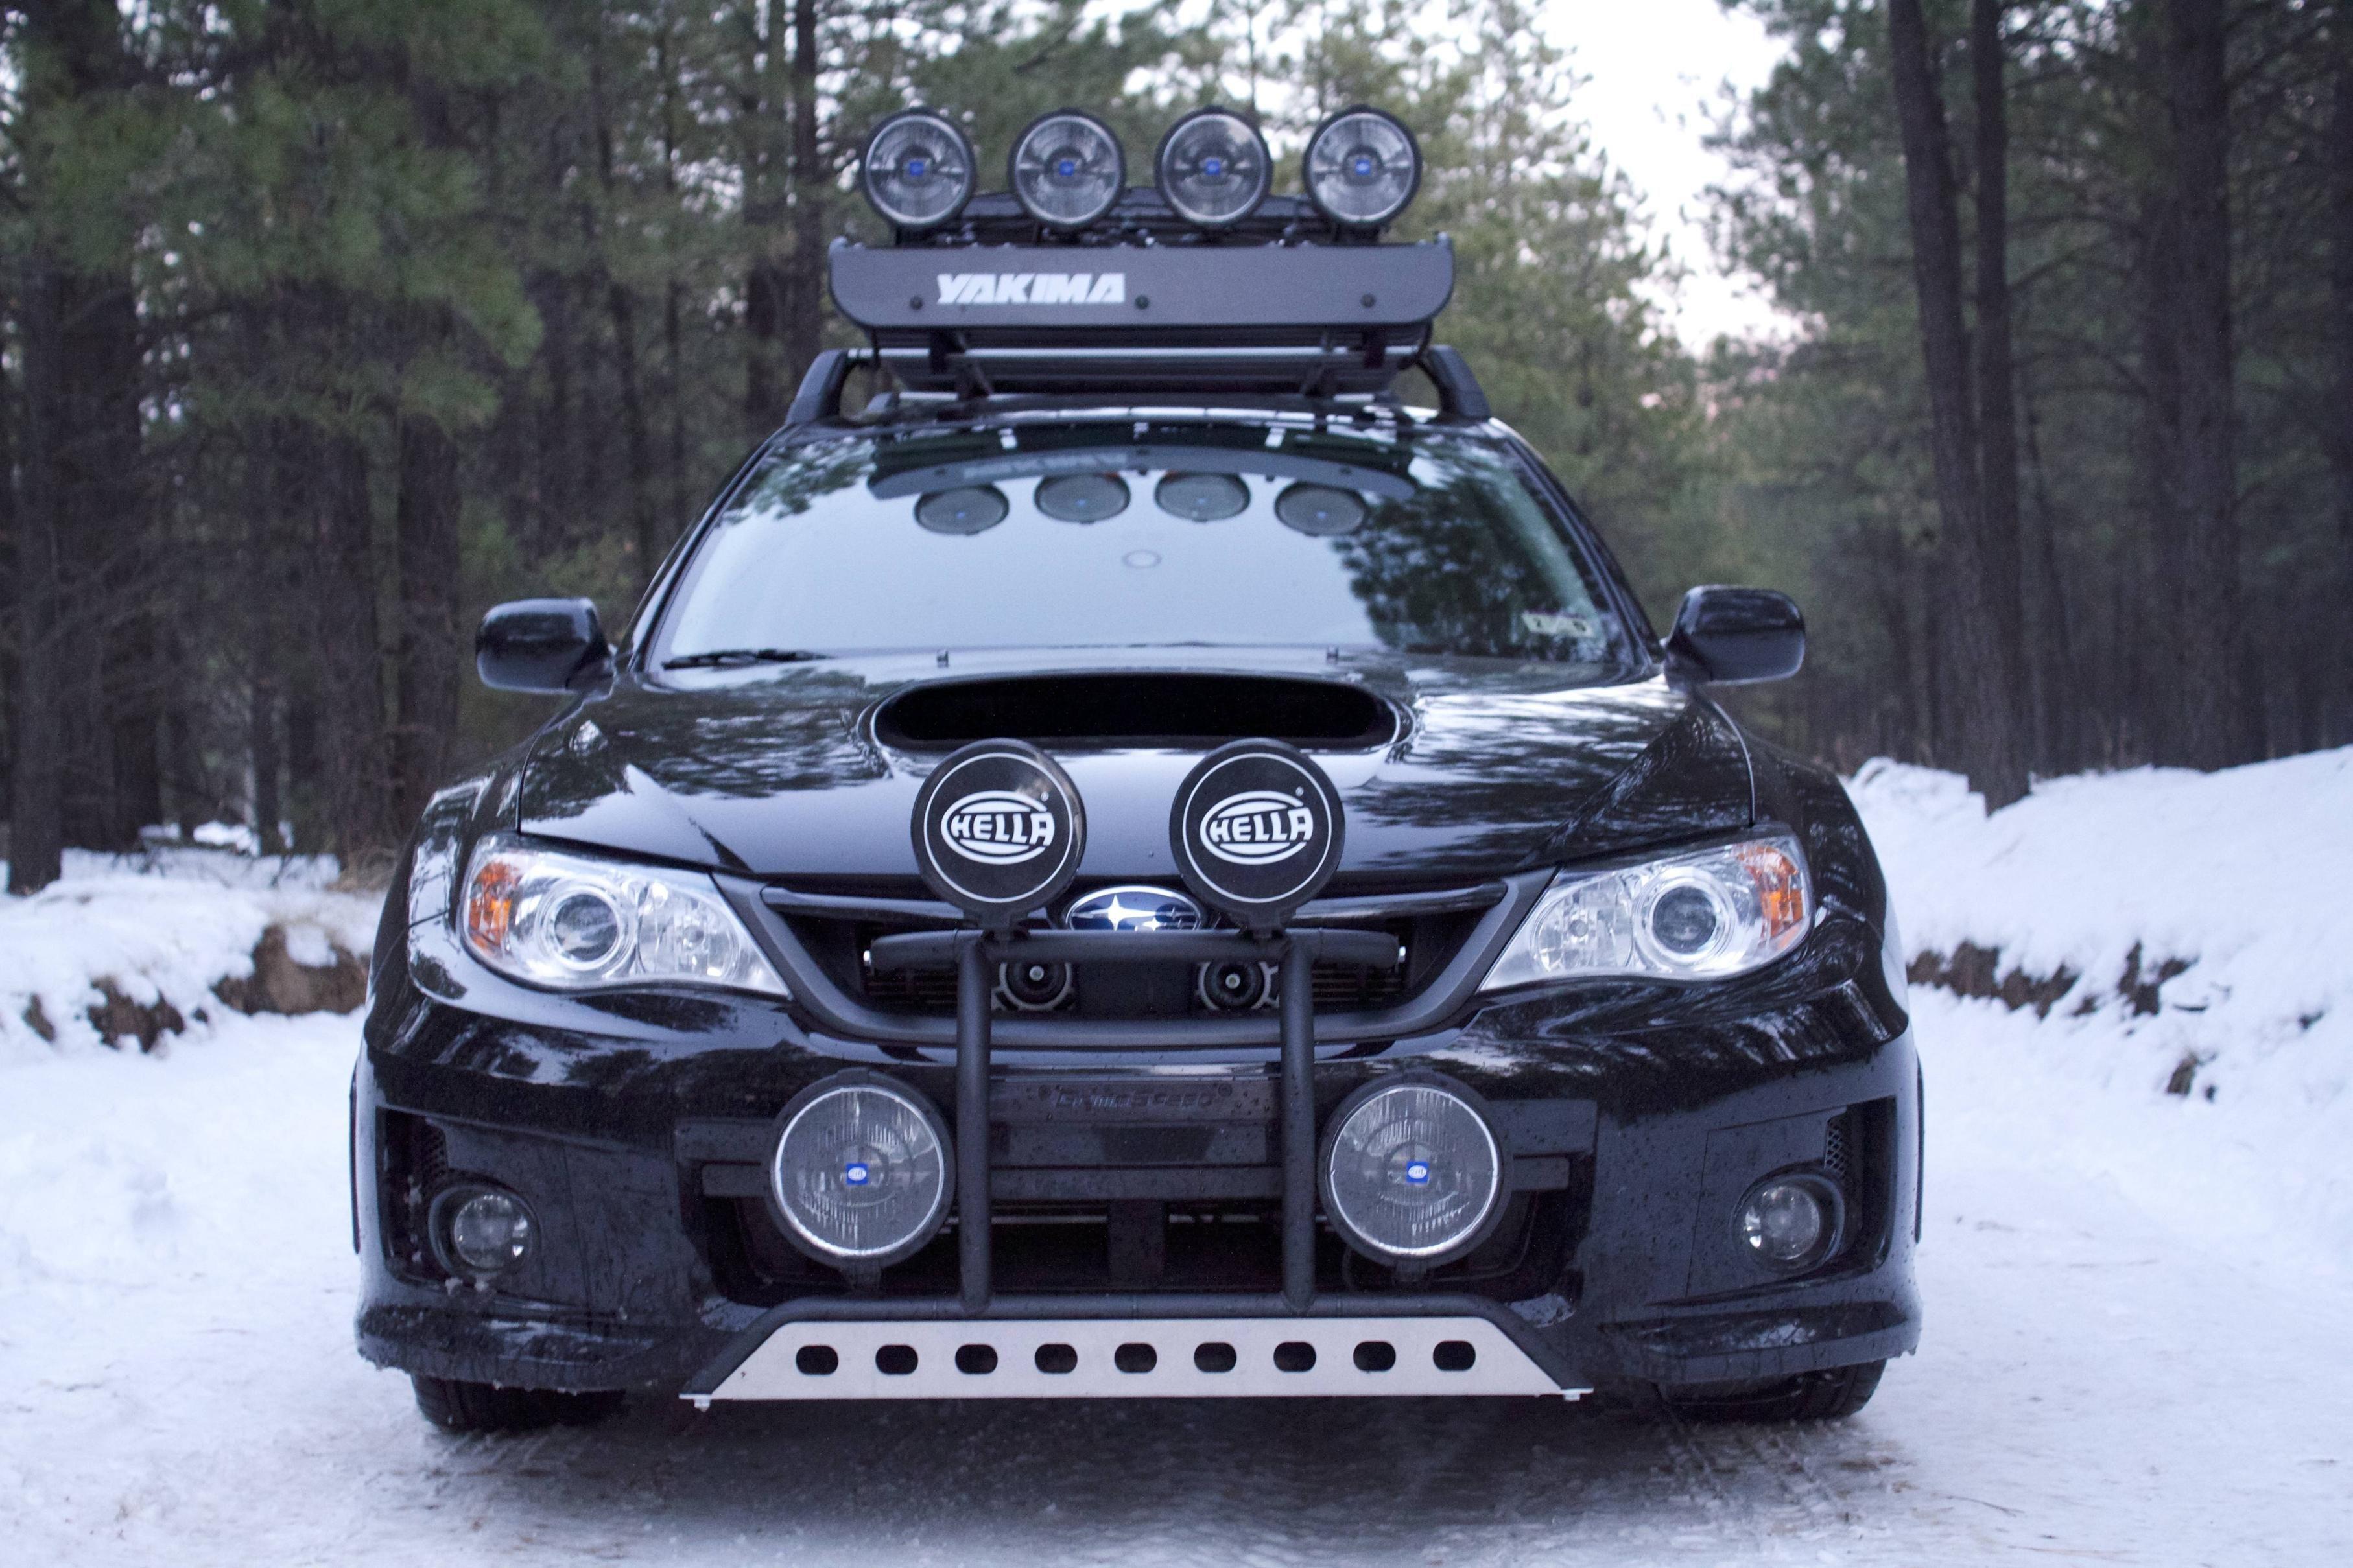 Snowy Subie Imgur Subaru Outback Offroad Lifted Subaru Subaru Cars